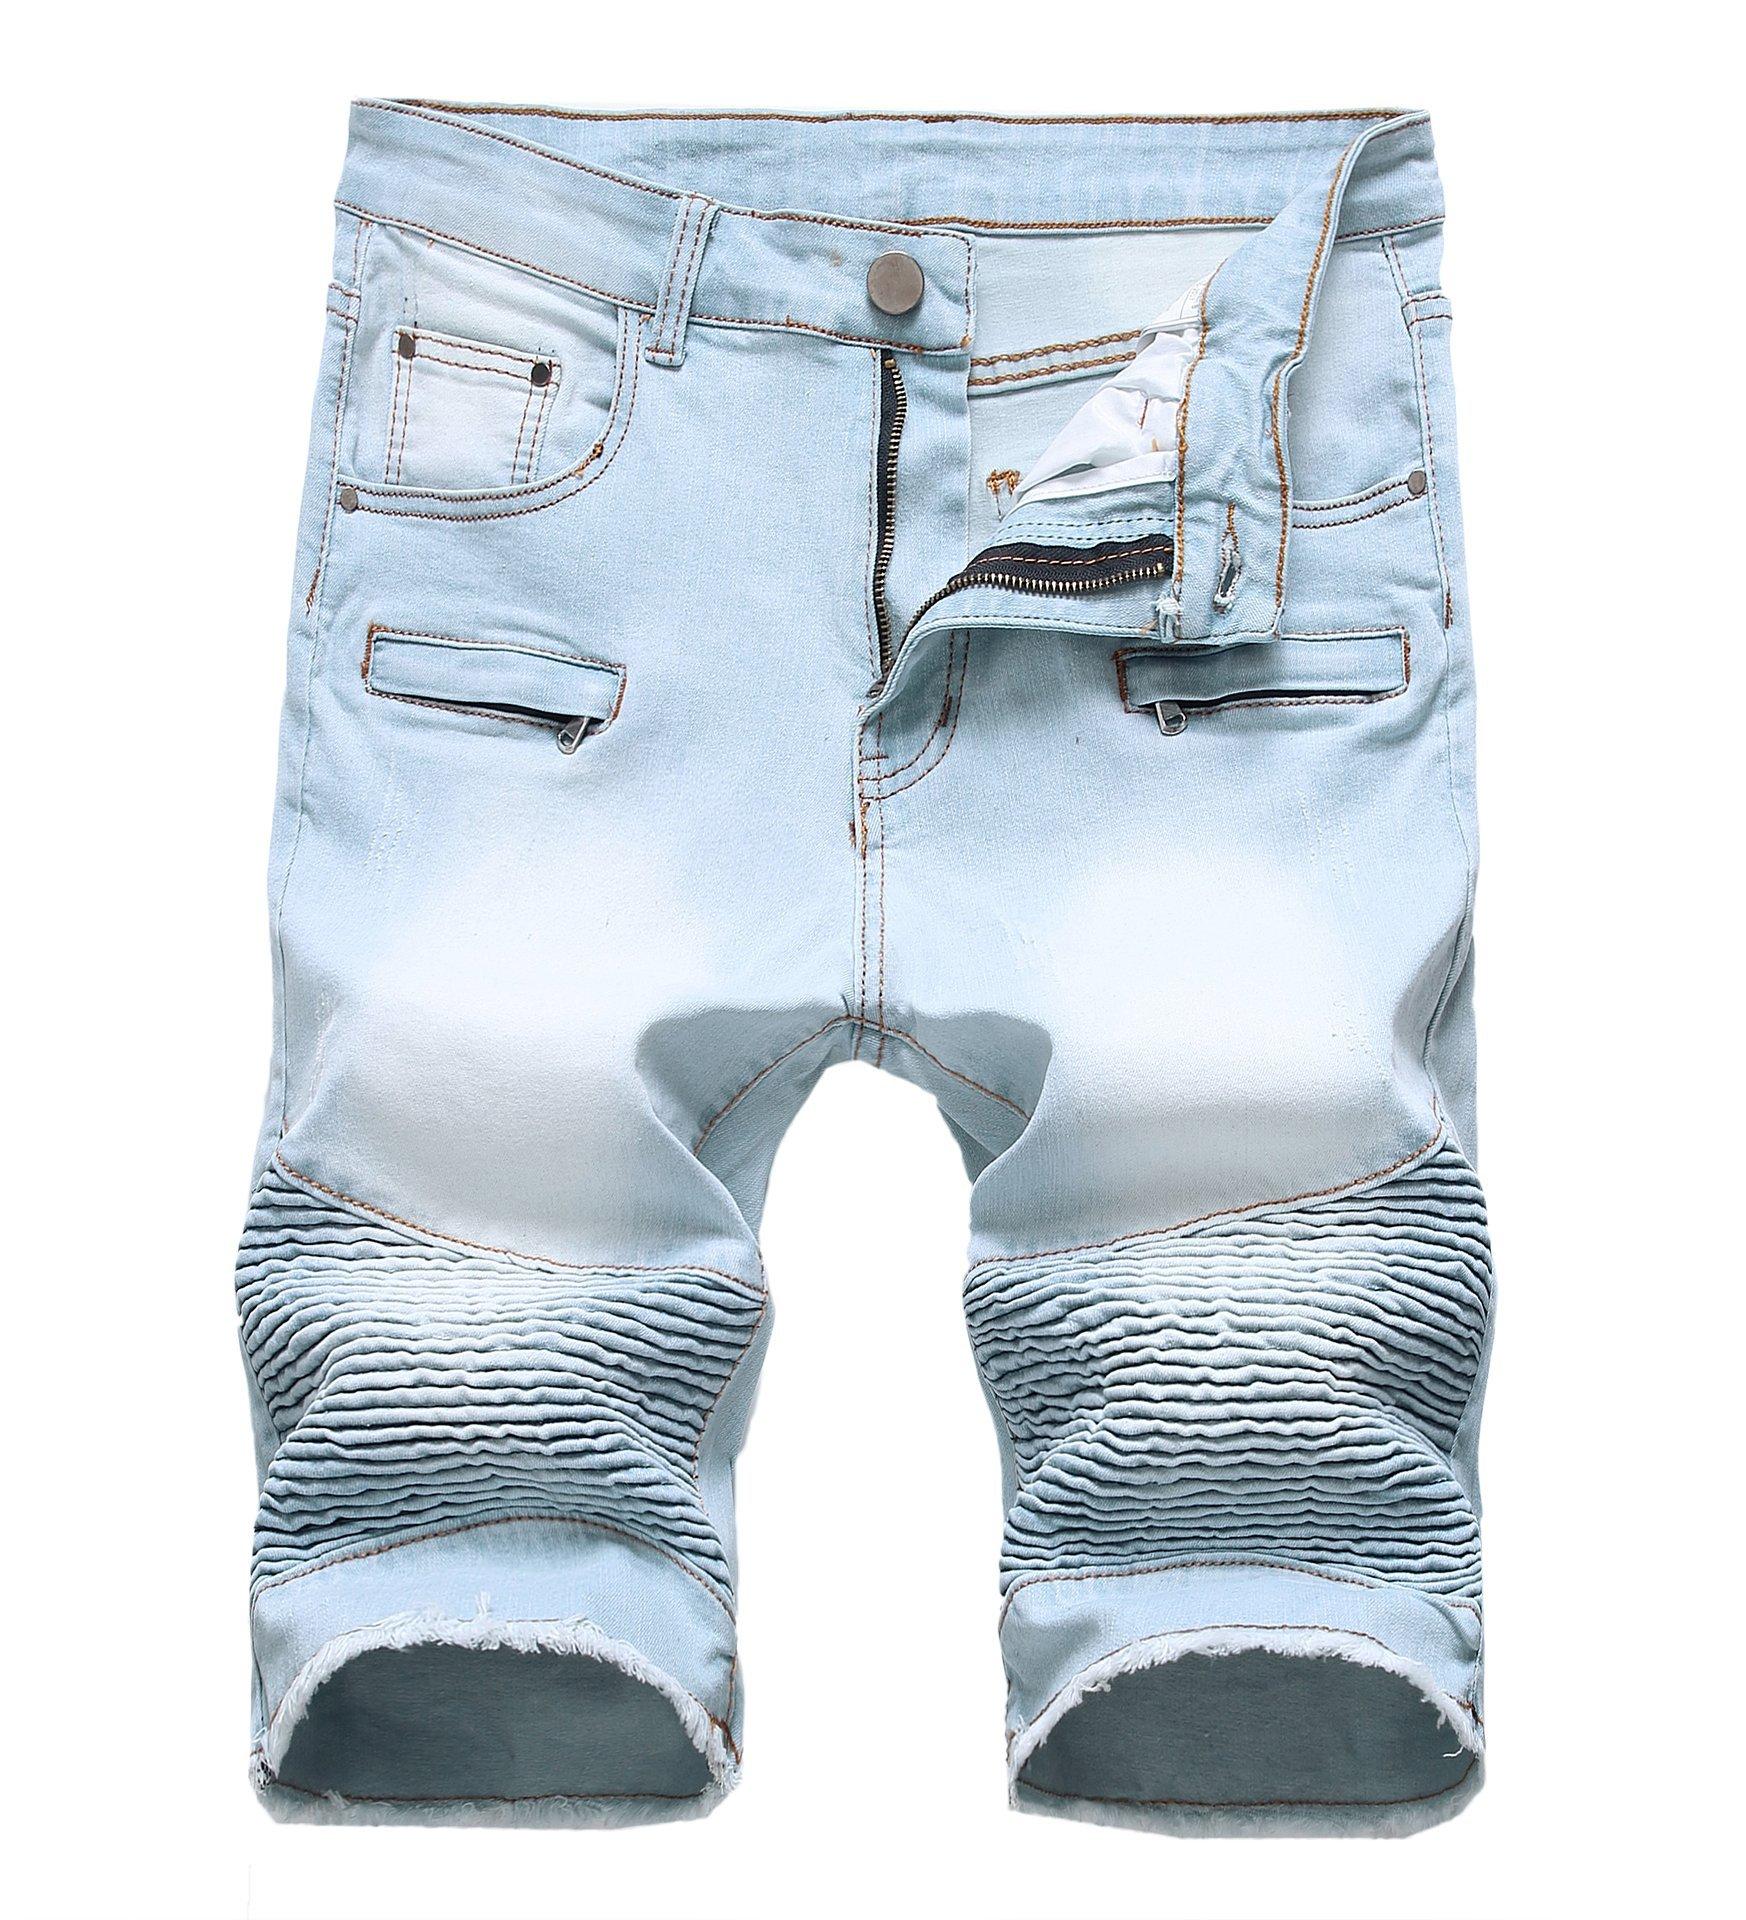 CLANNAD Men's Moto Biker Shorts Jeans Zipper Denim Casual Slim Shorts with Hole Light Blue 42